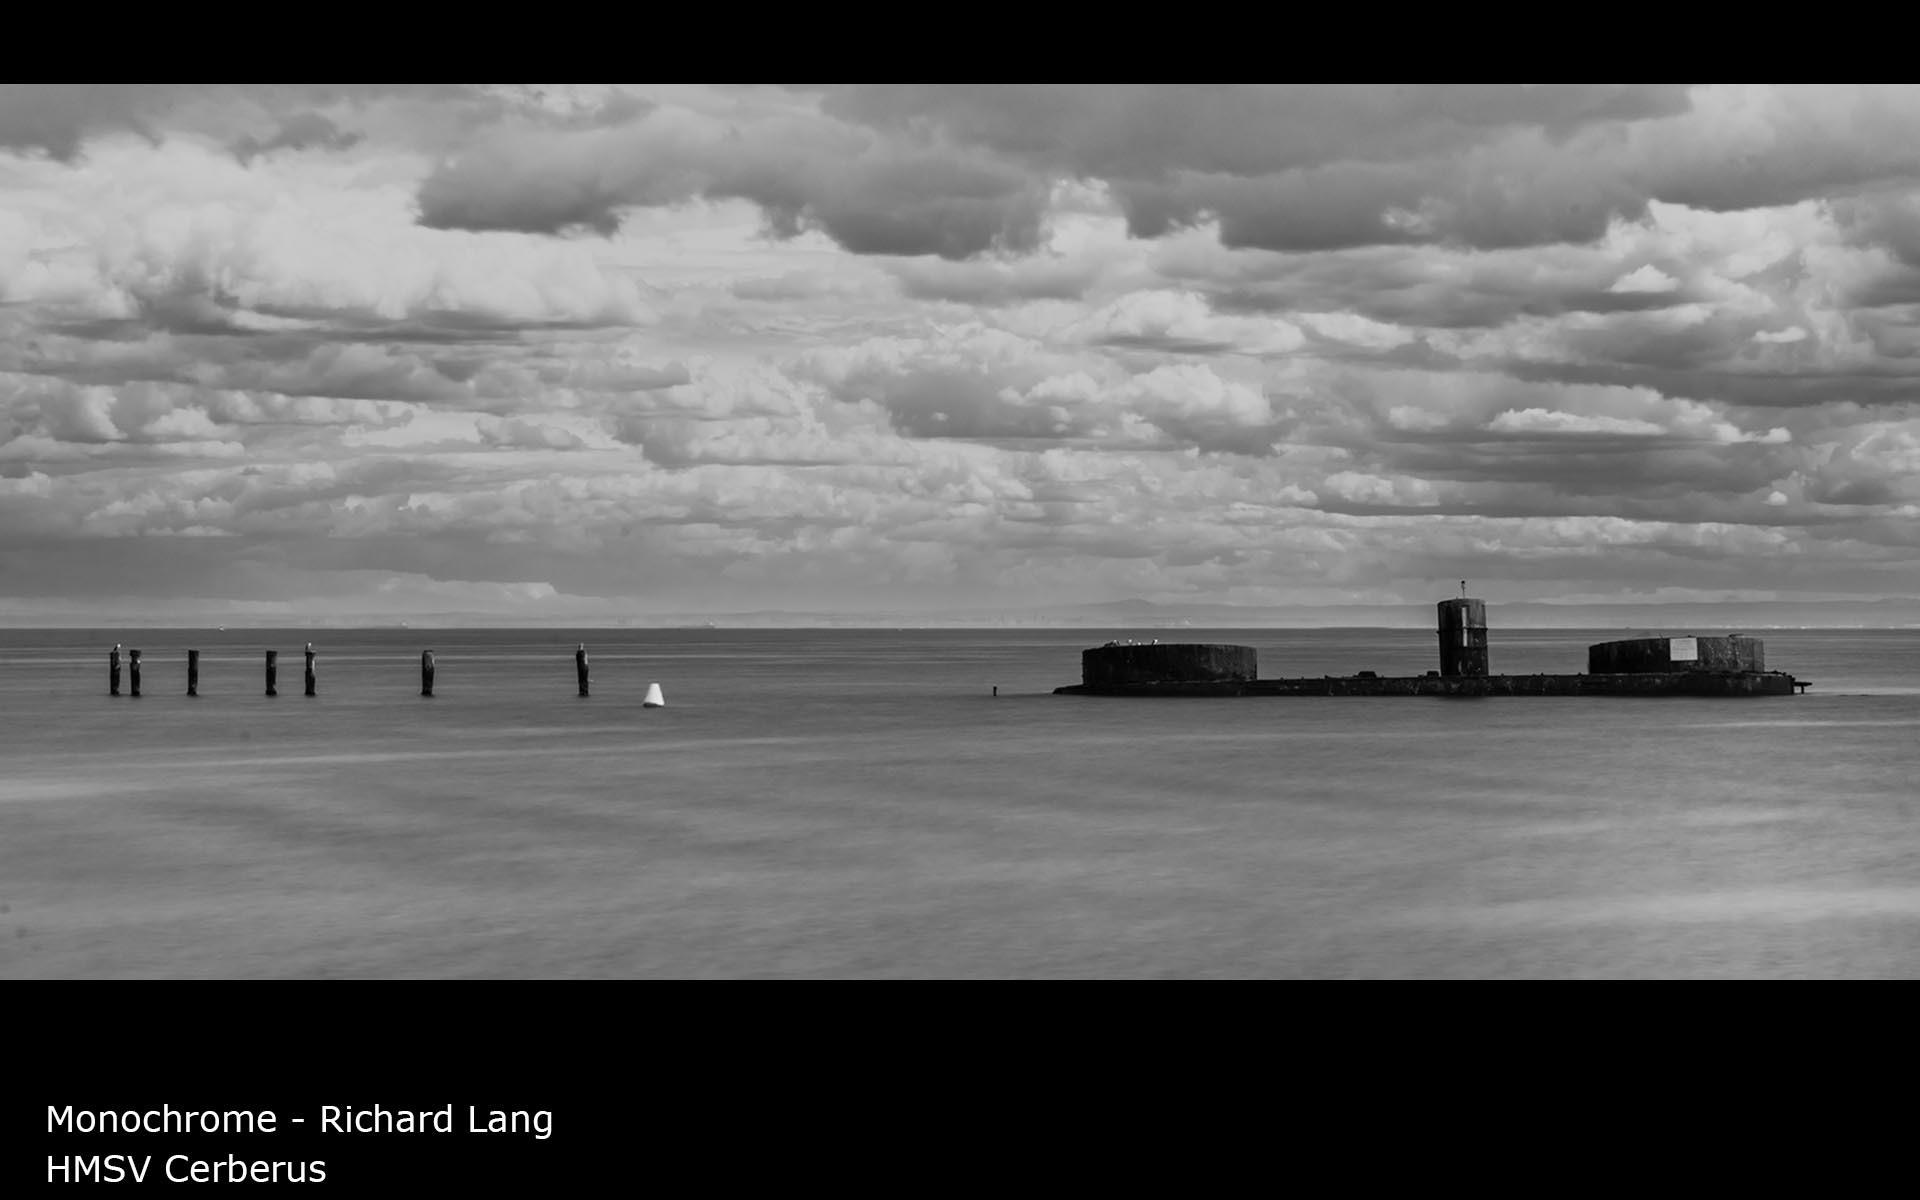 HMSV Cerberus - Richard Lang